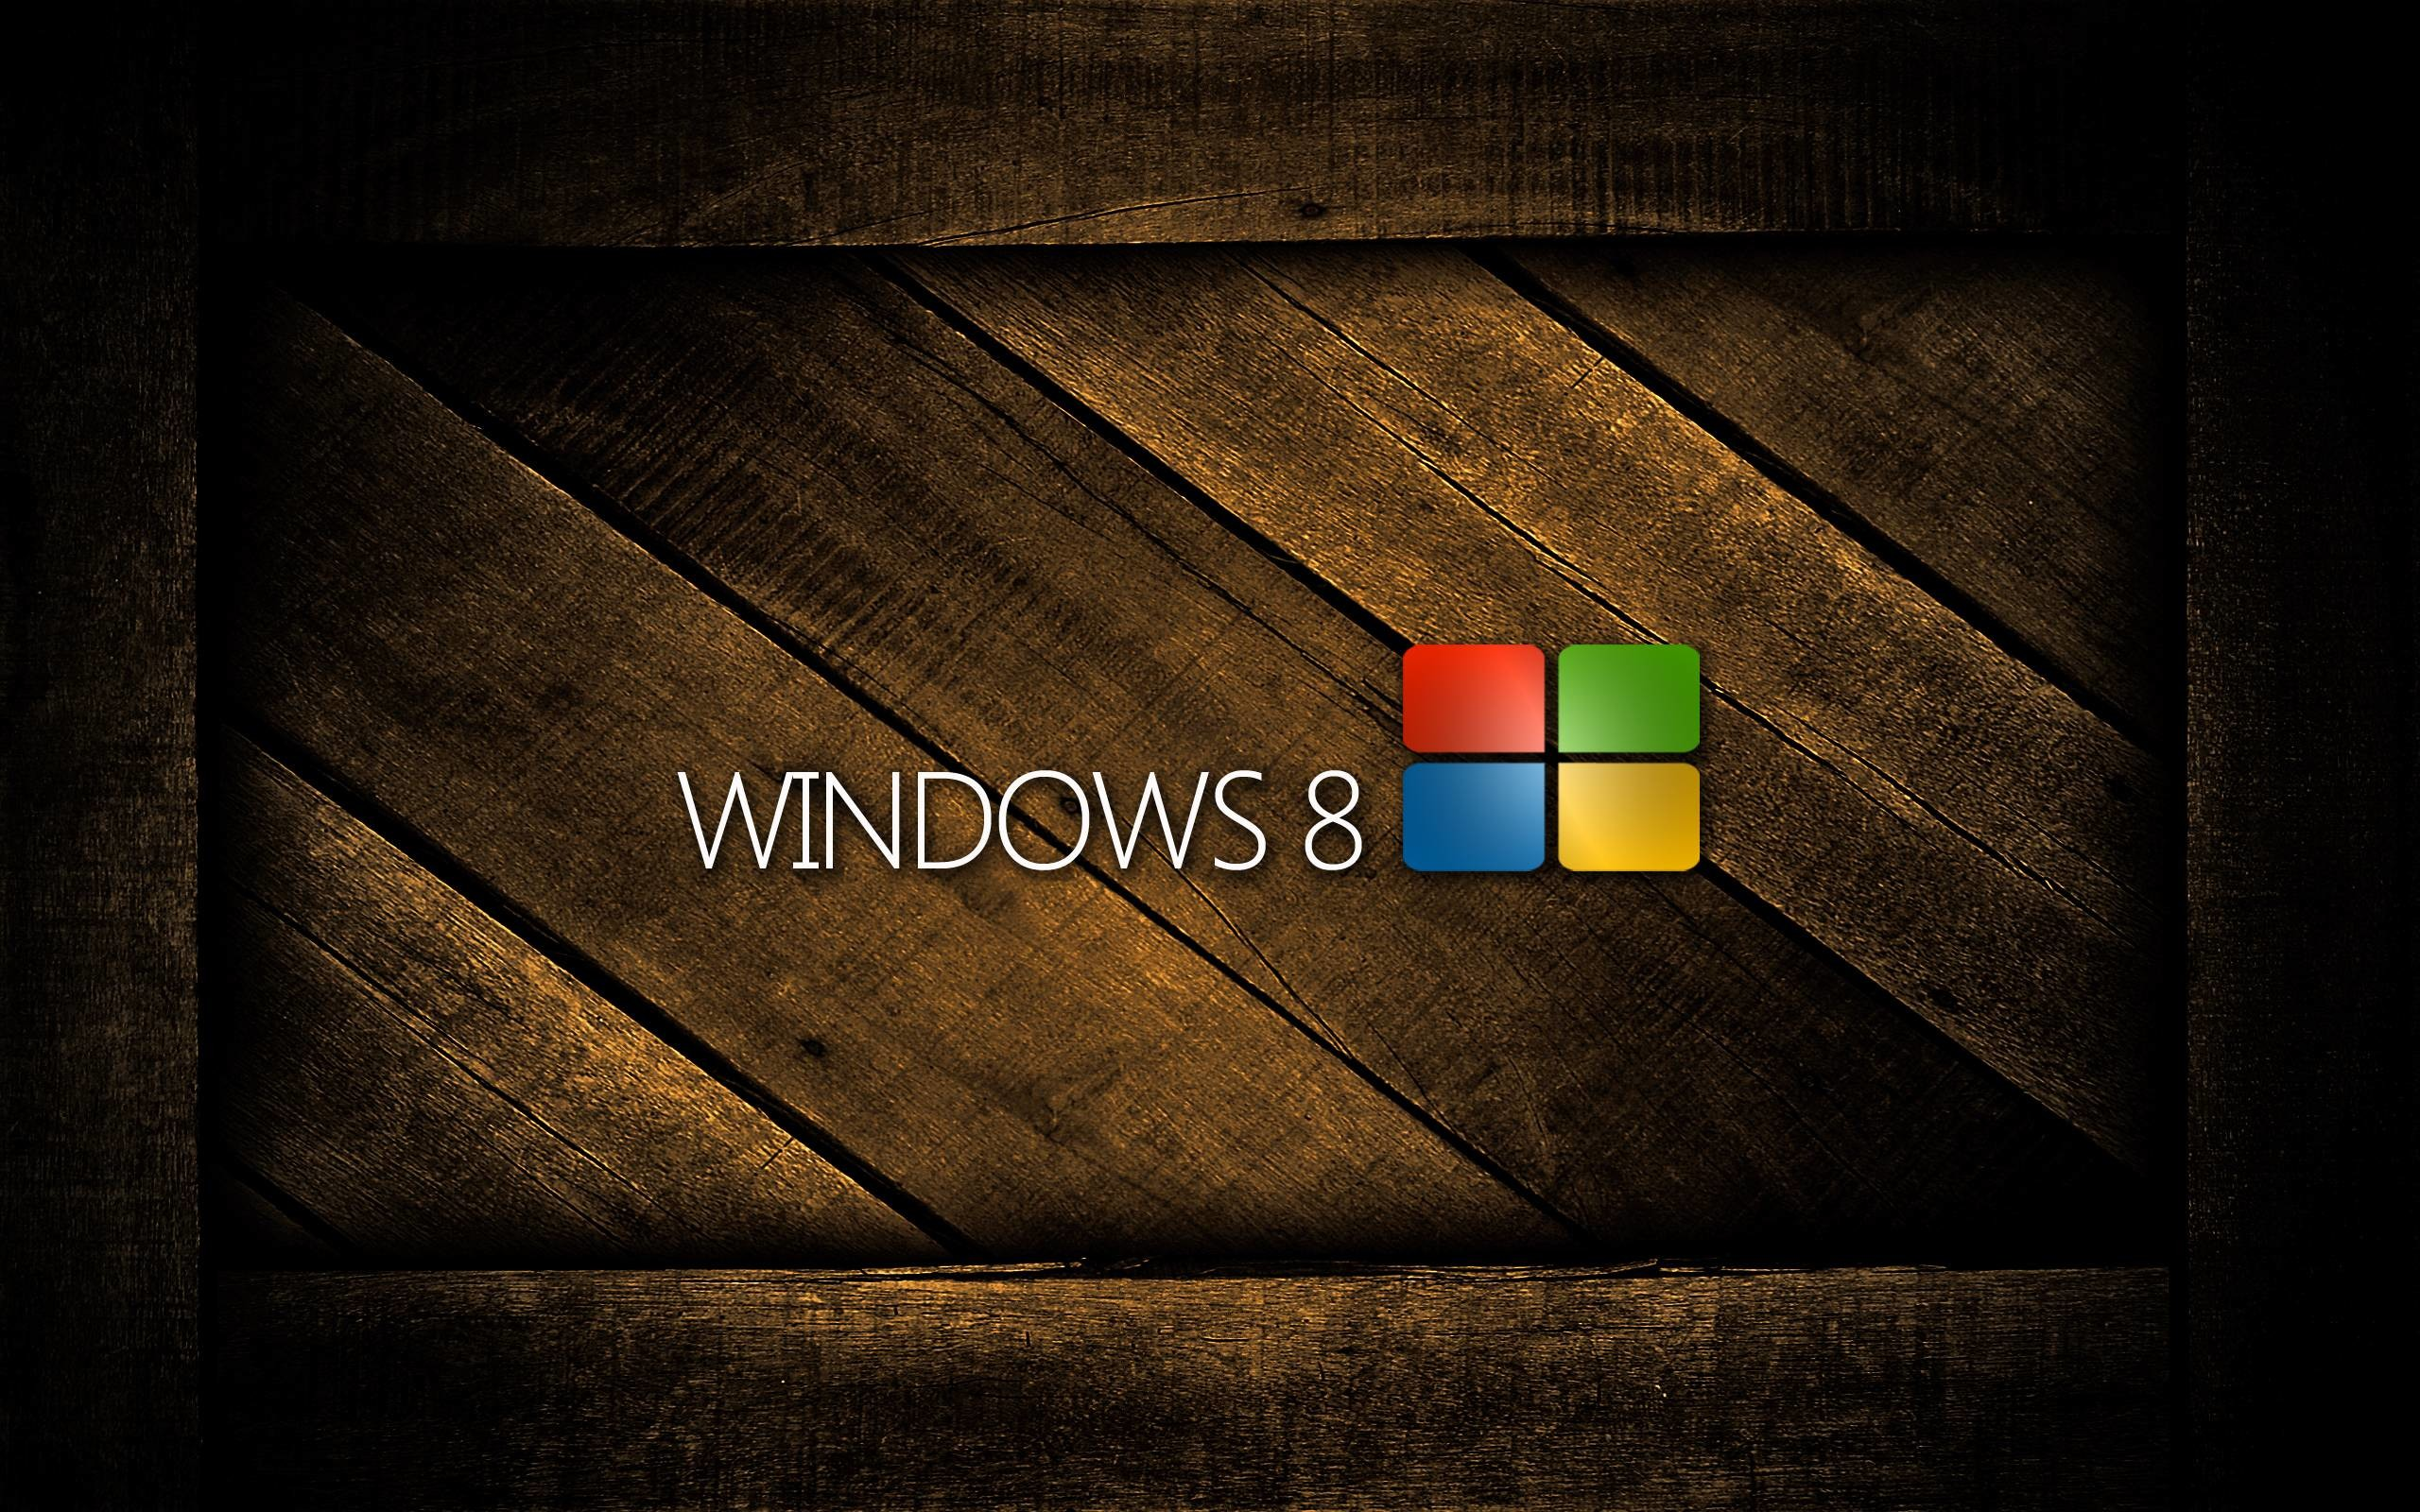 … windows 8 hd wallpapers wallpaper cave; live …